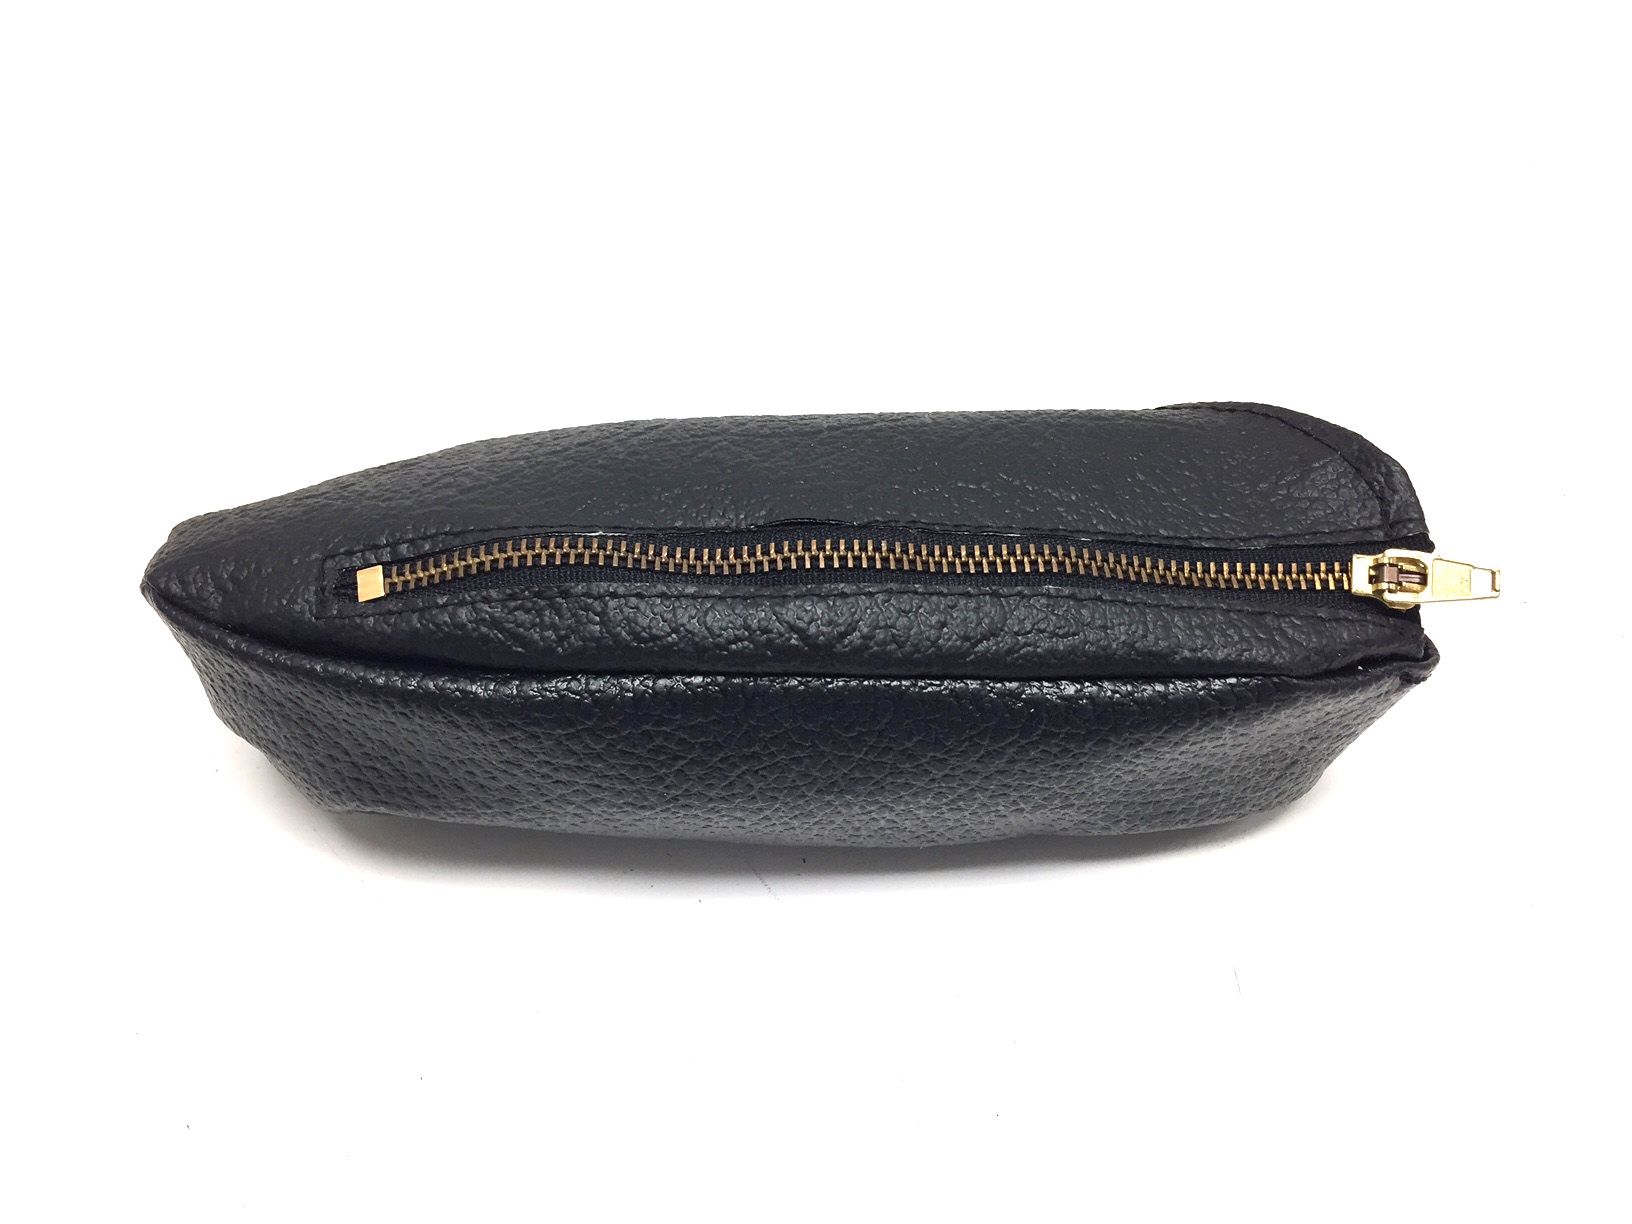 Bsa A65 A70 Vinyl Zippered Tool Bag 68 9134 Ebay